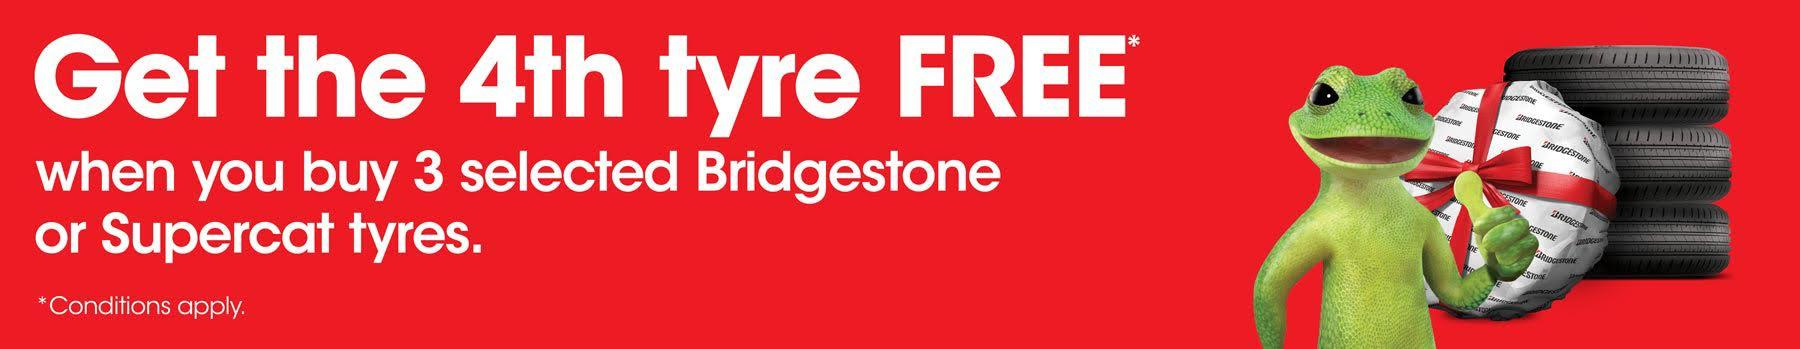 Bridgestone and Supercat Buy 3 Get 1 Free!